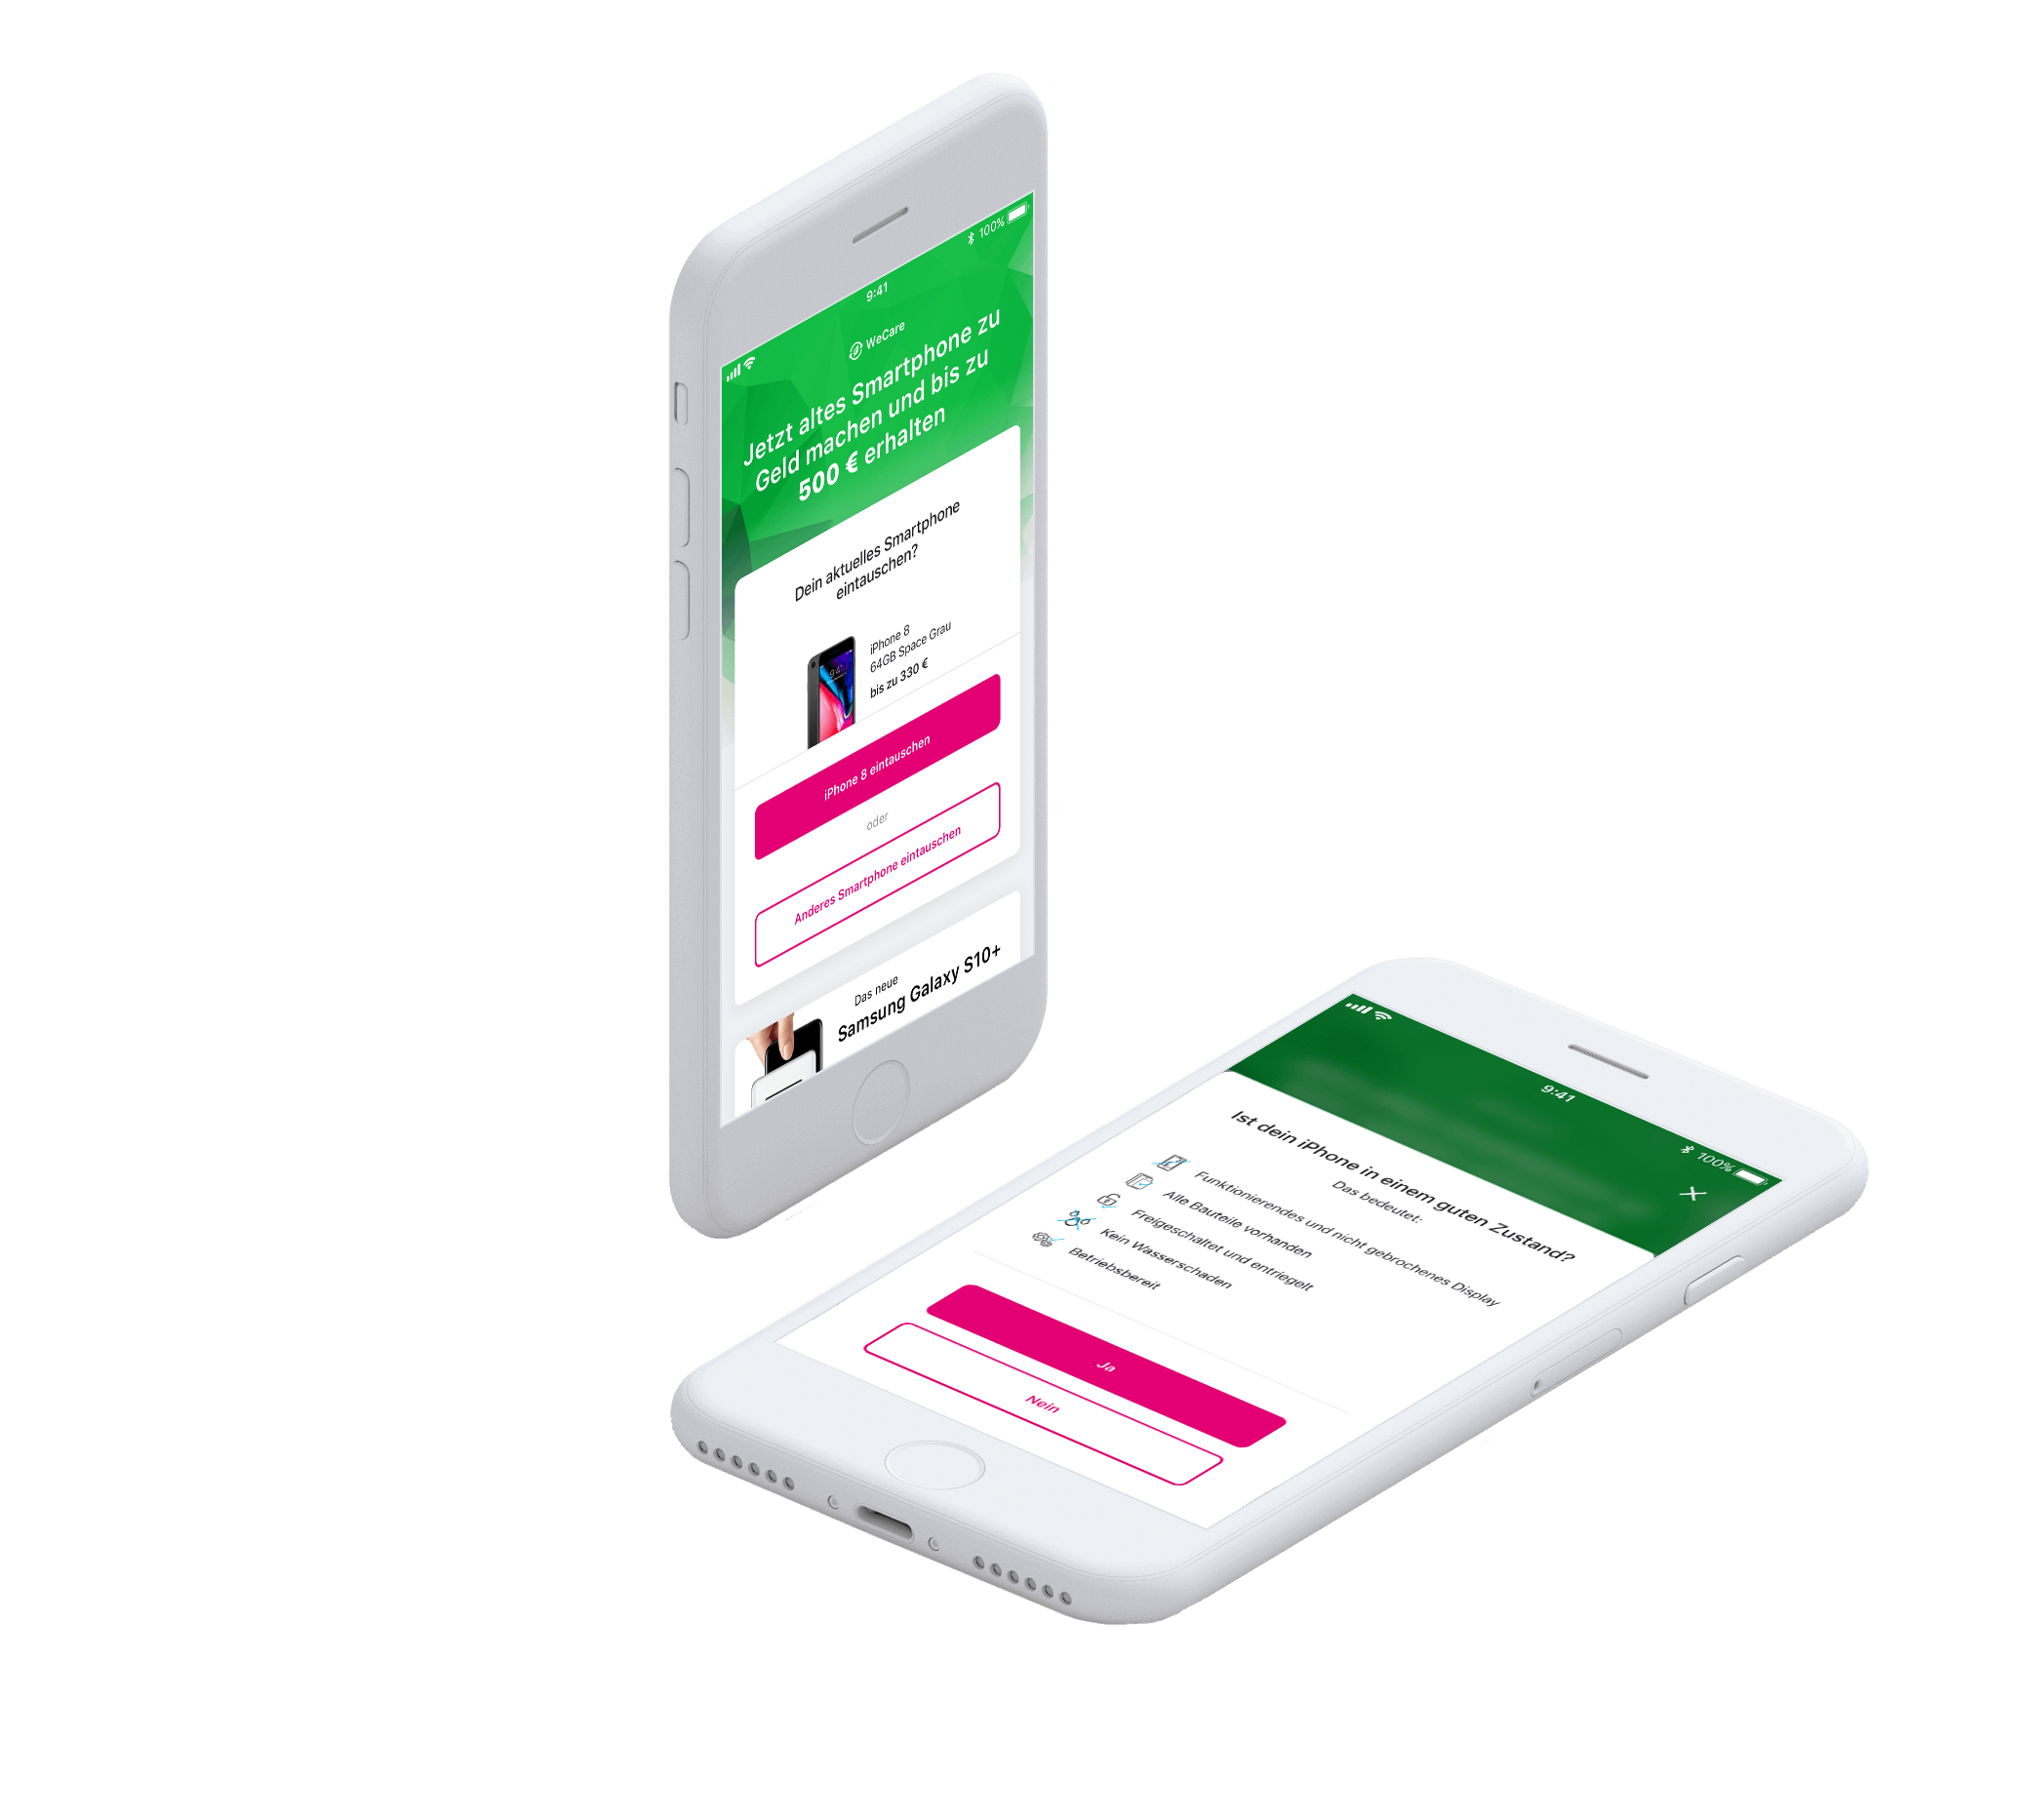 We Care: Mit dem Browser oder in der MeinMagenta App